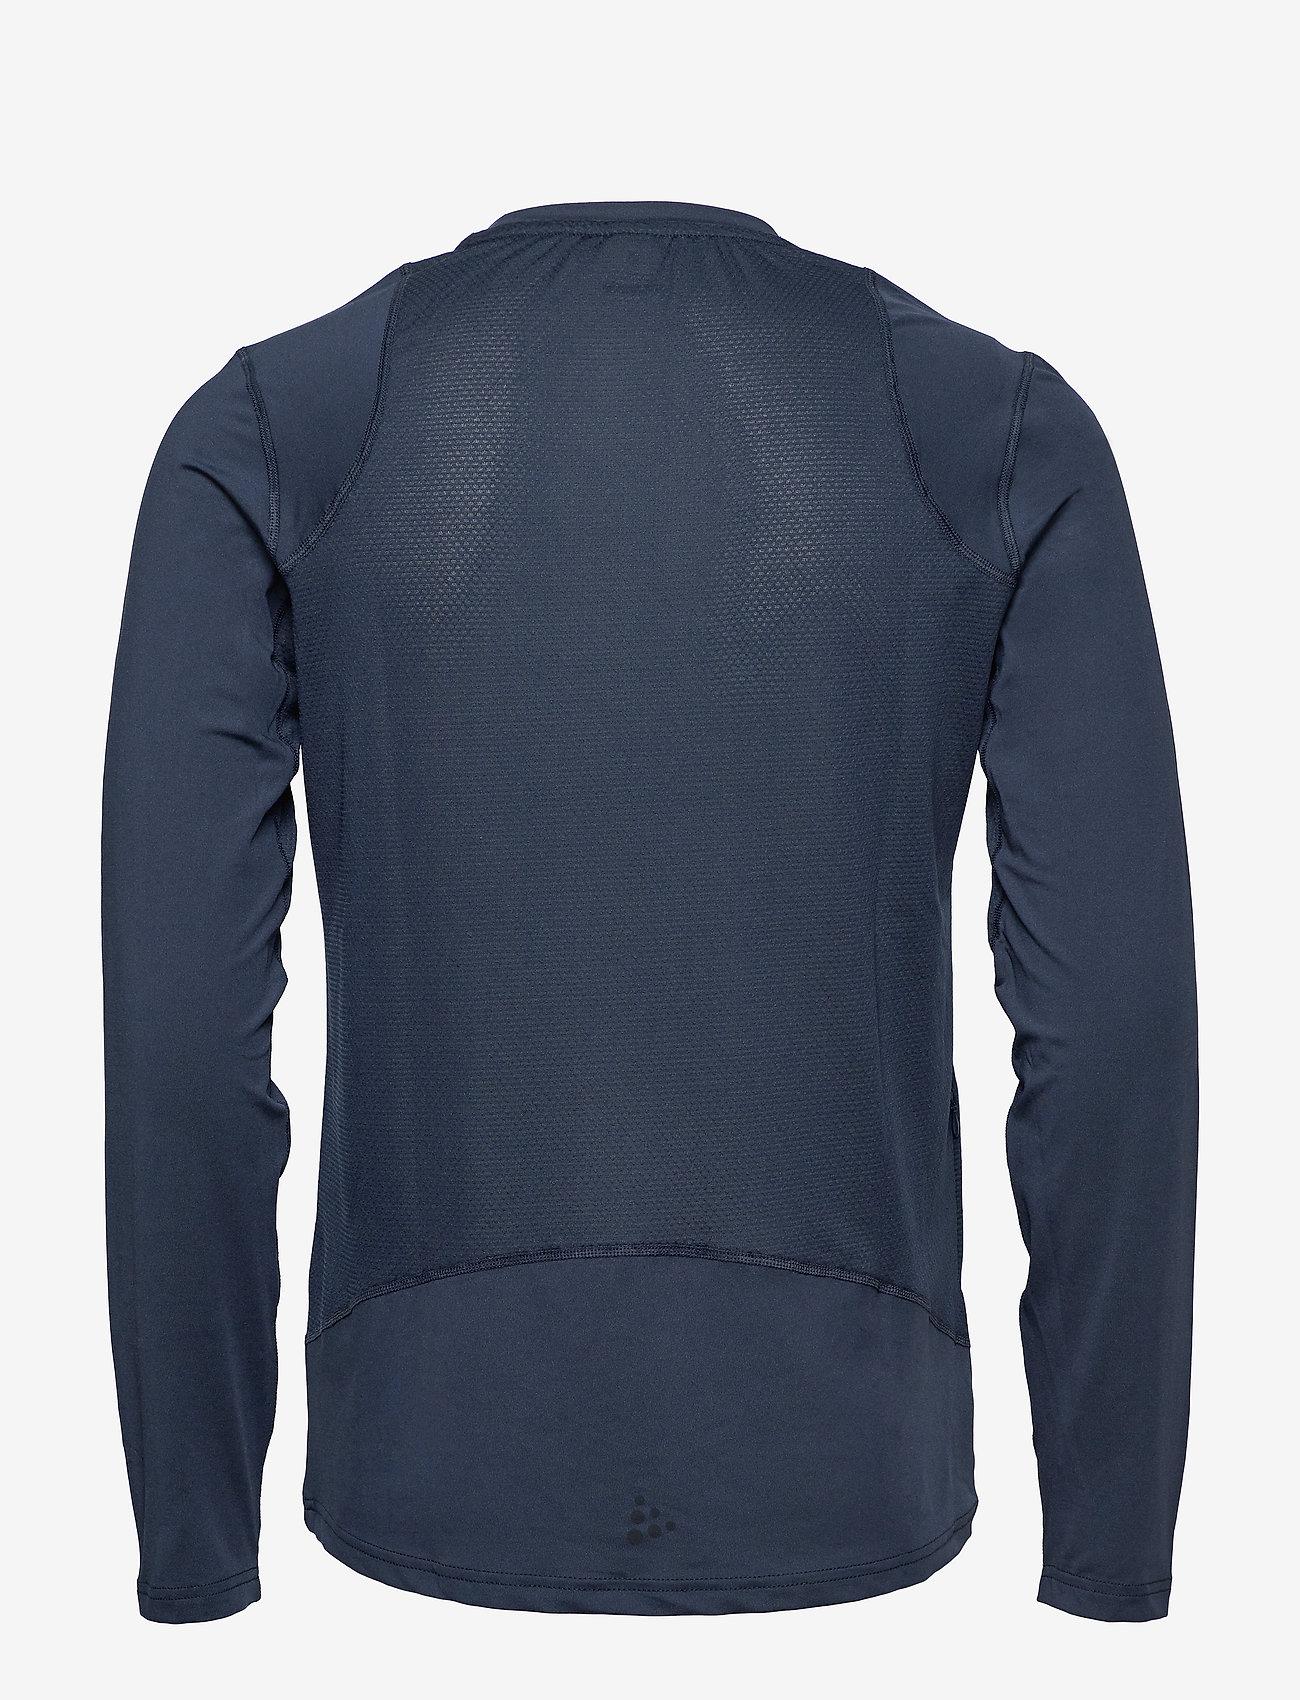 Craft ADV ESSENCE LS TEE M - T-skjorter BLAZE - Menn Klær